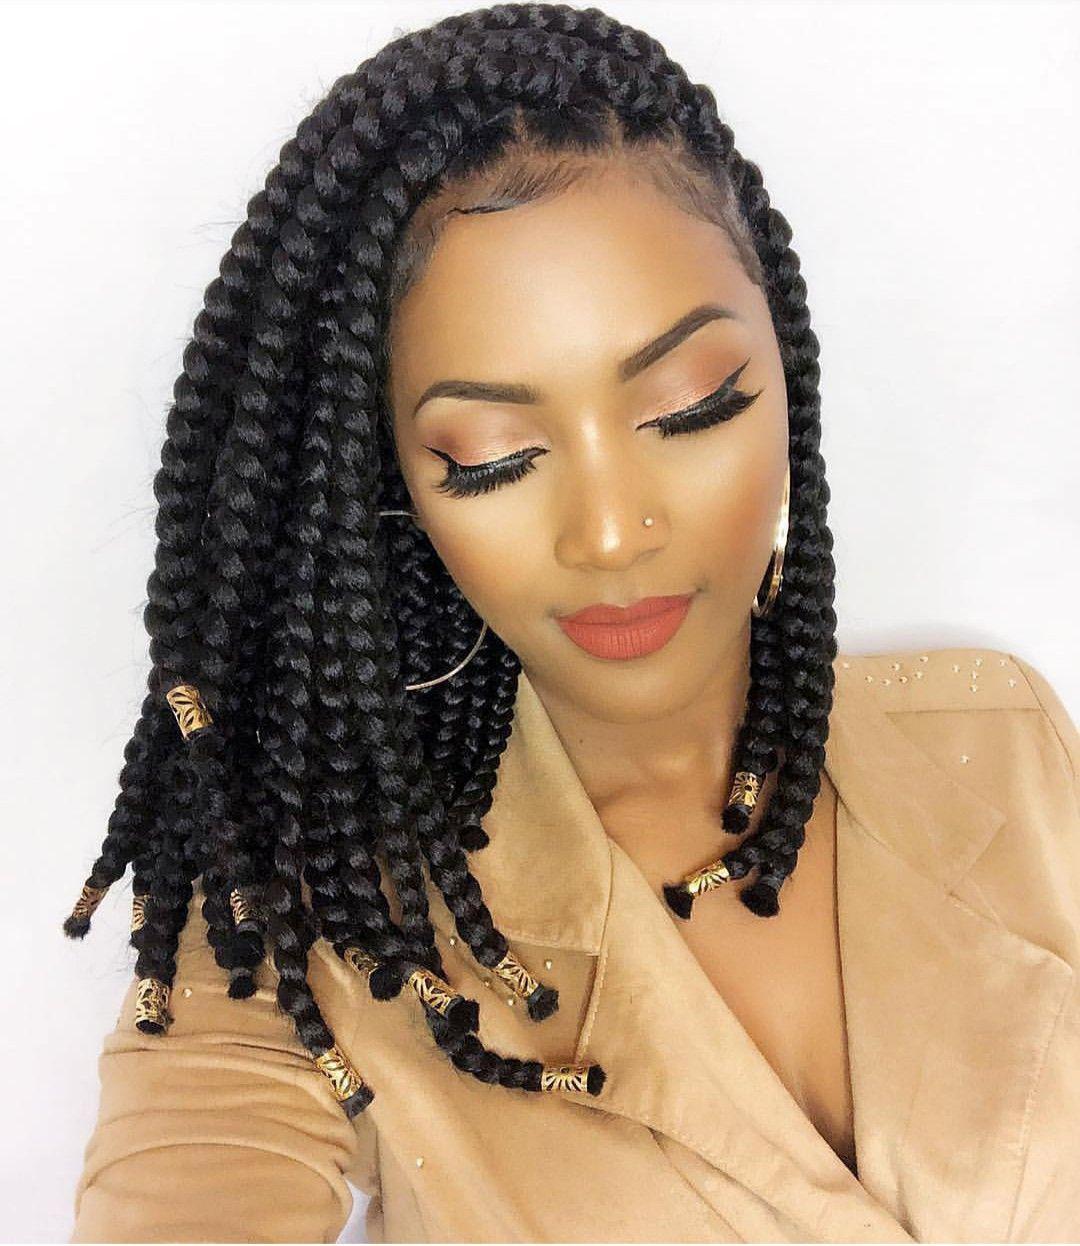 Pin by Shakeira C on Twist Braids \u0026 Locs in 2019